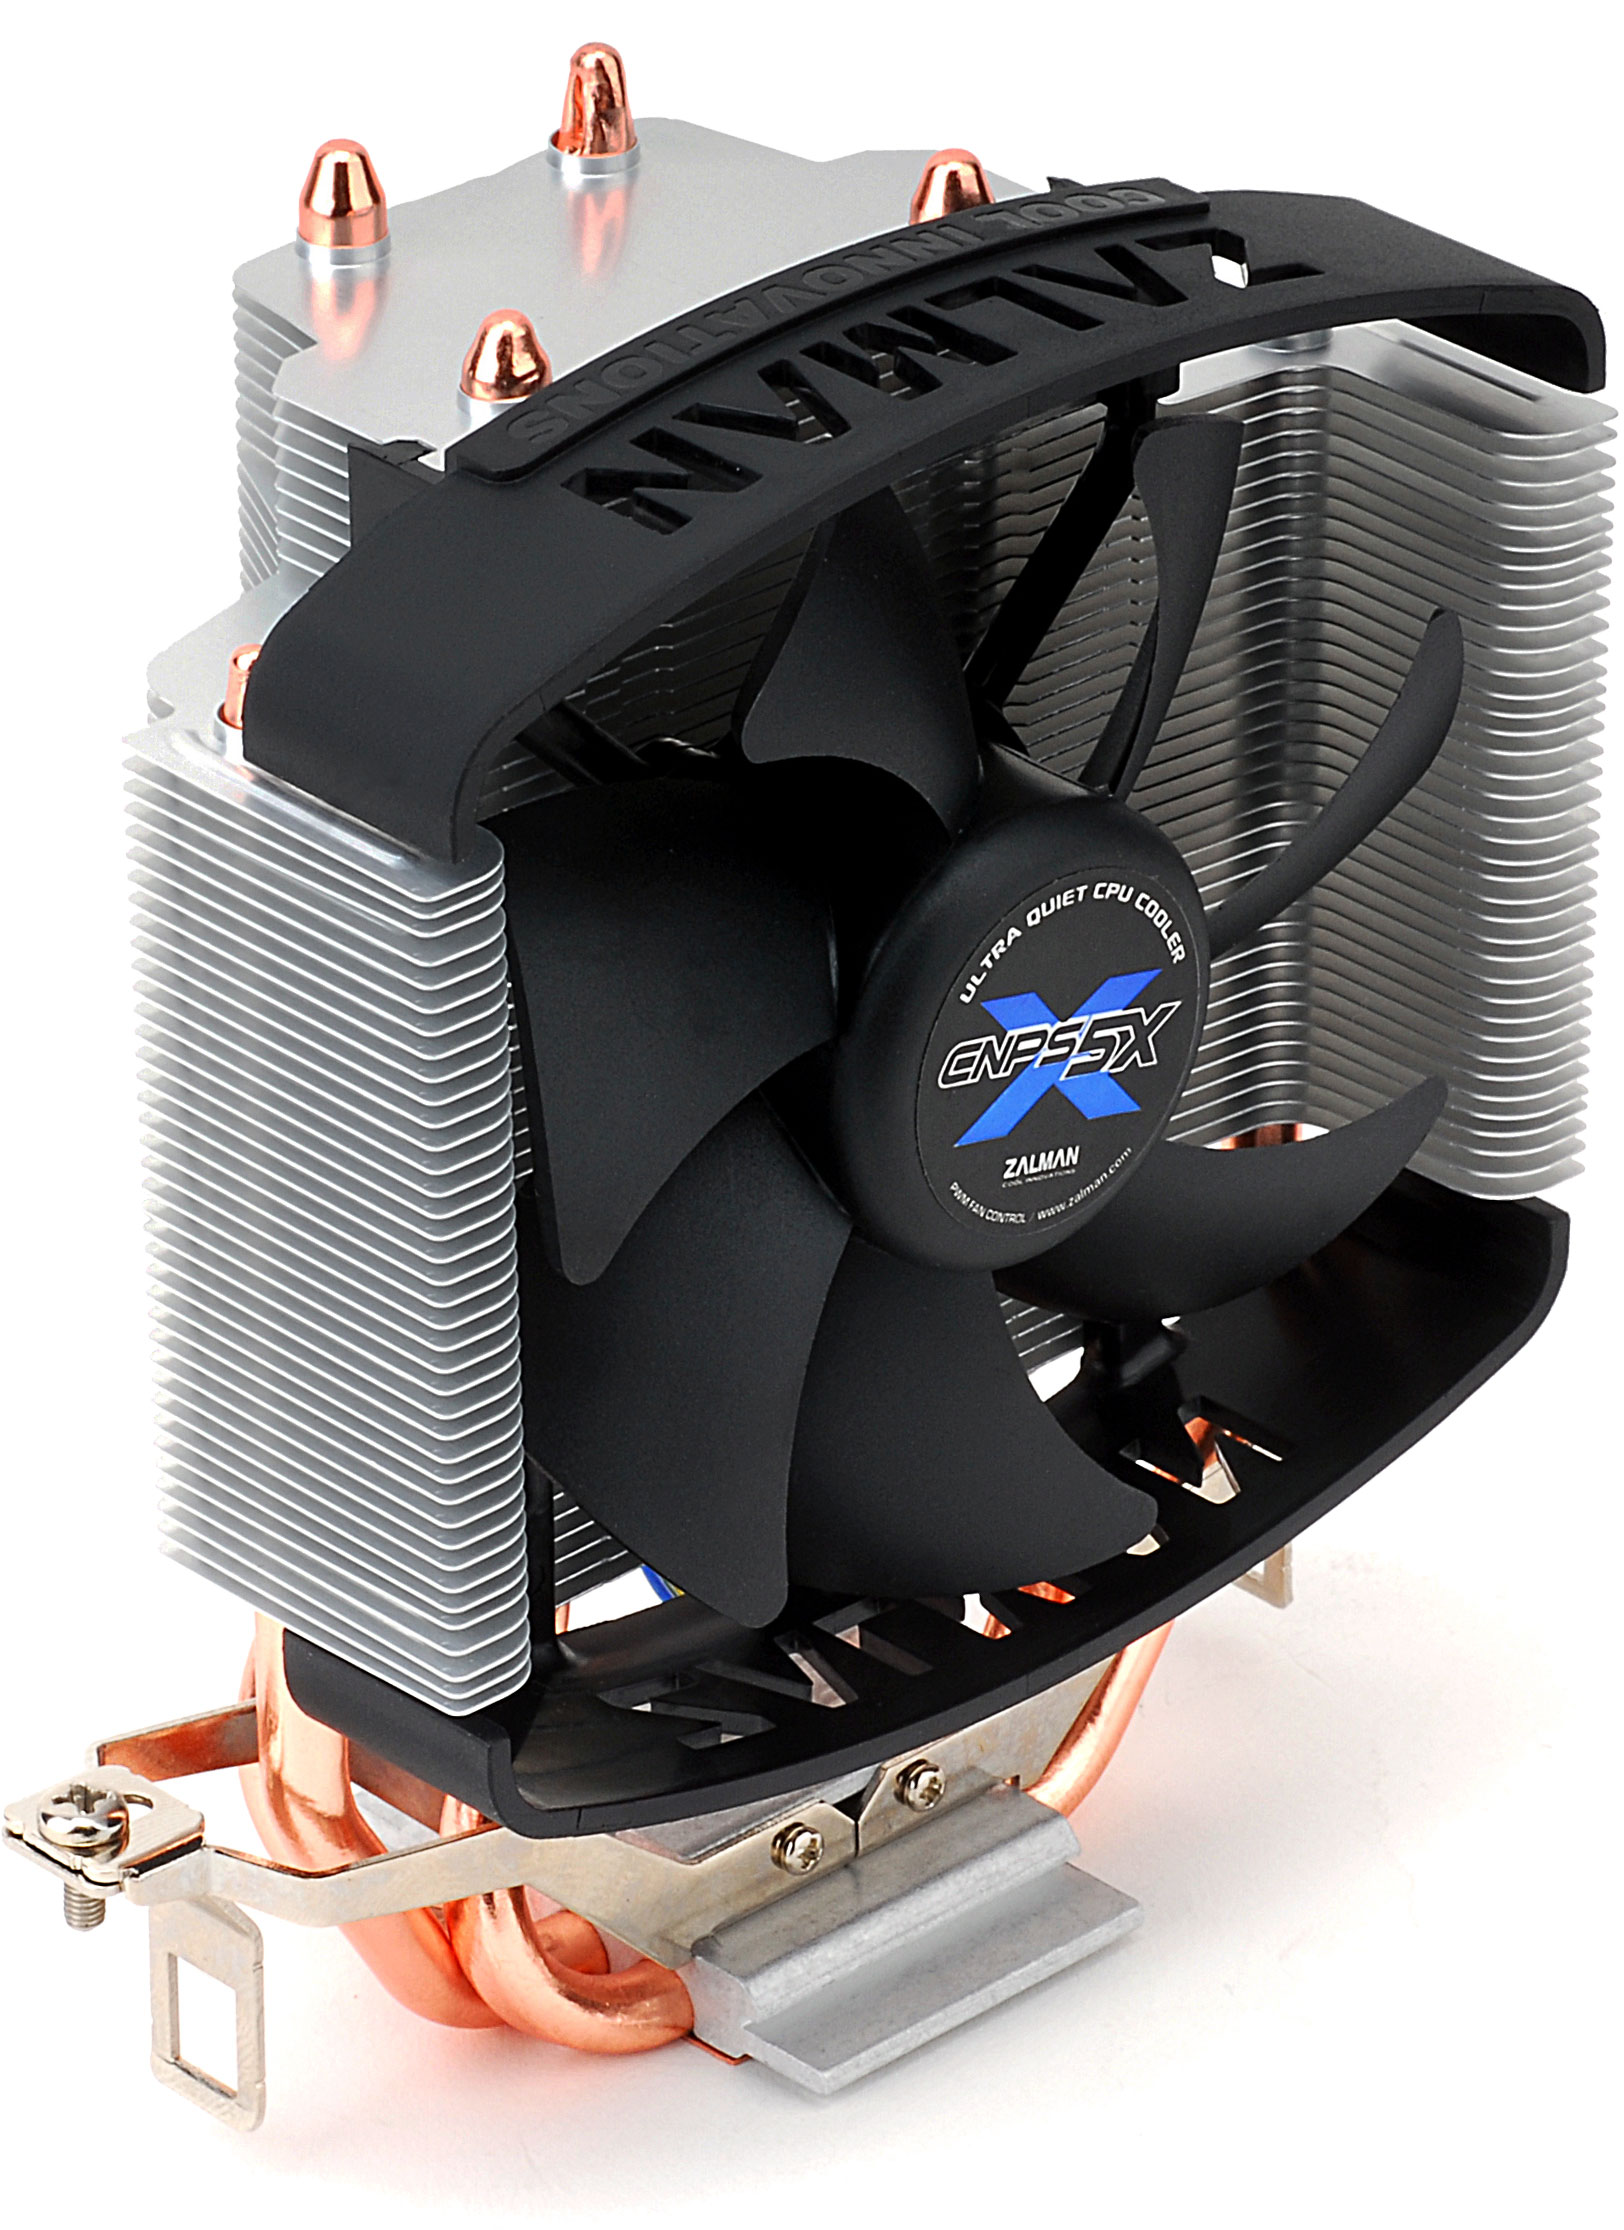 Cnps5x Quiet Compact Tower Cpu Cooler